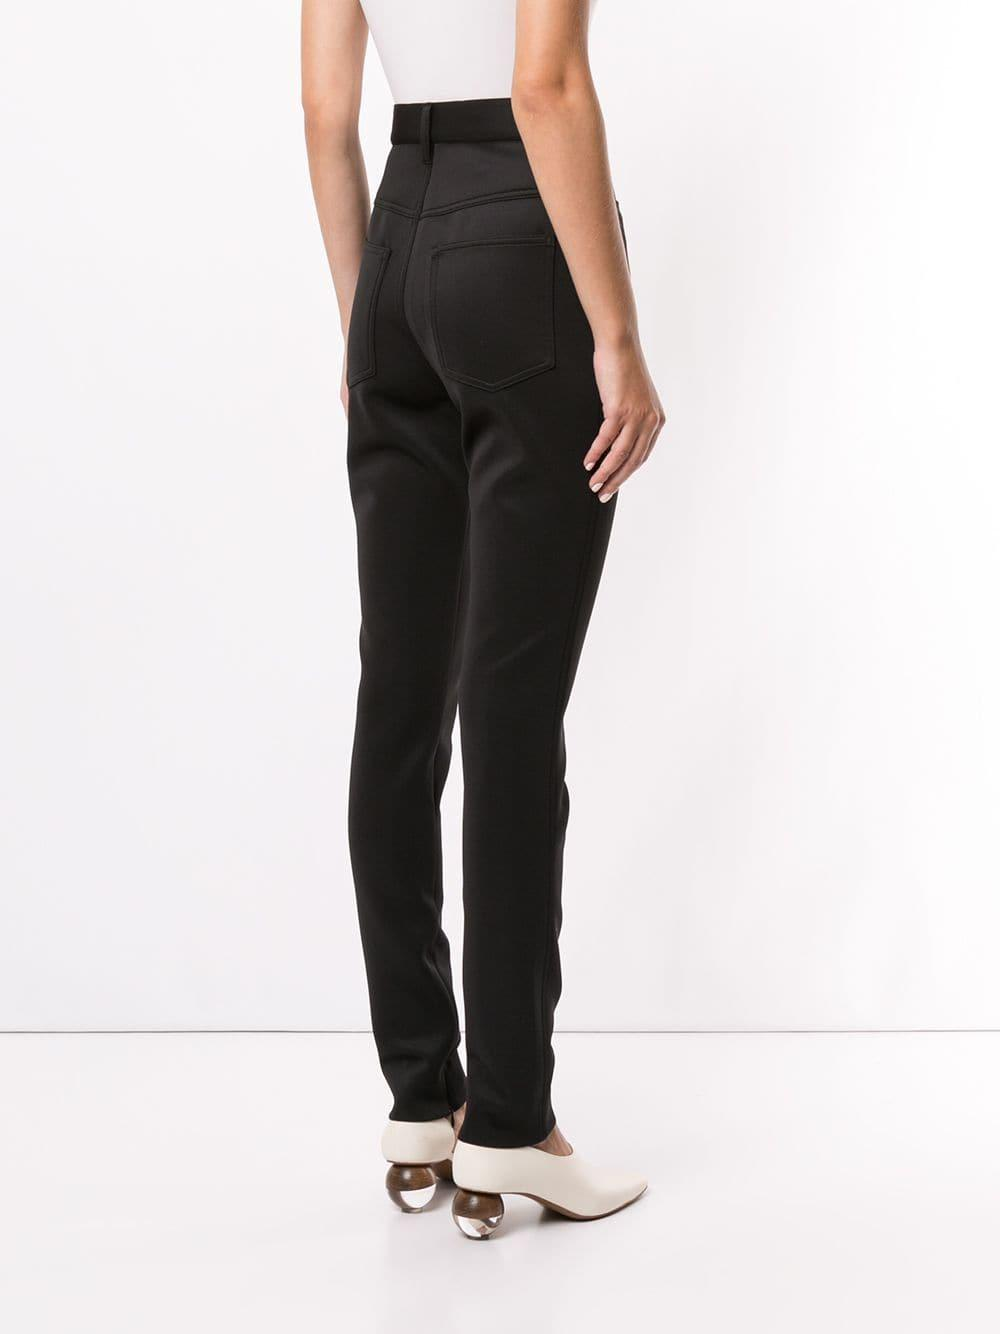 Pantalones pitillo Maison Margiela de Tejido sintético de color Negro